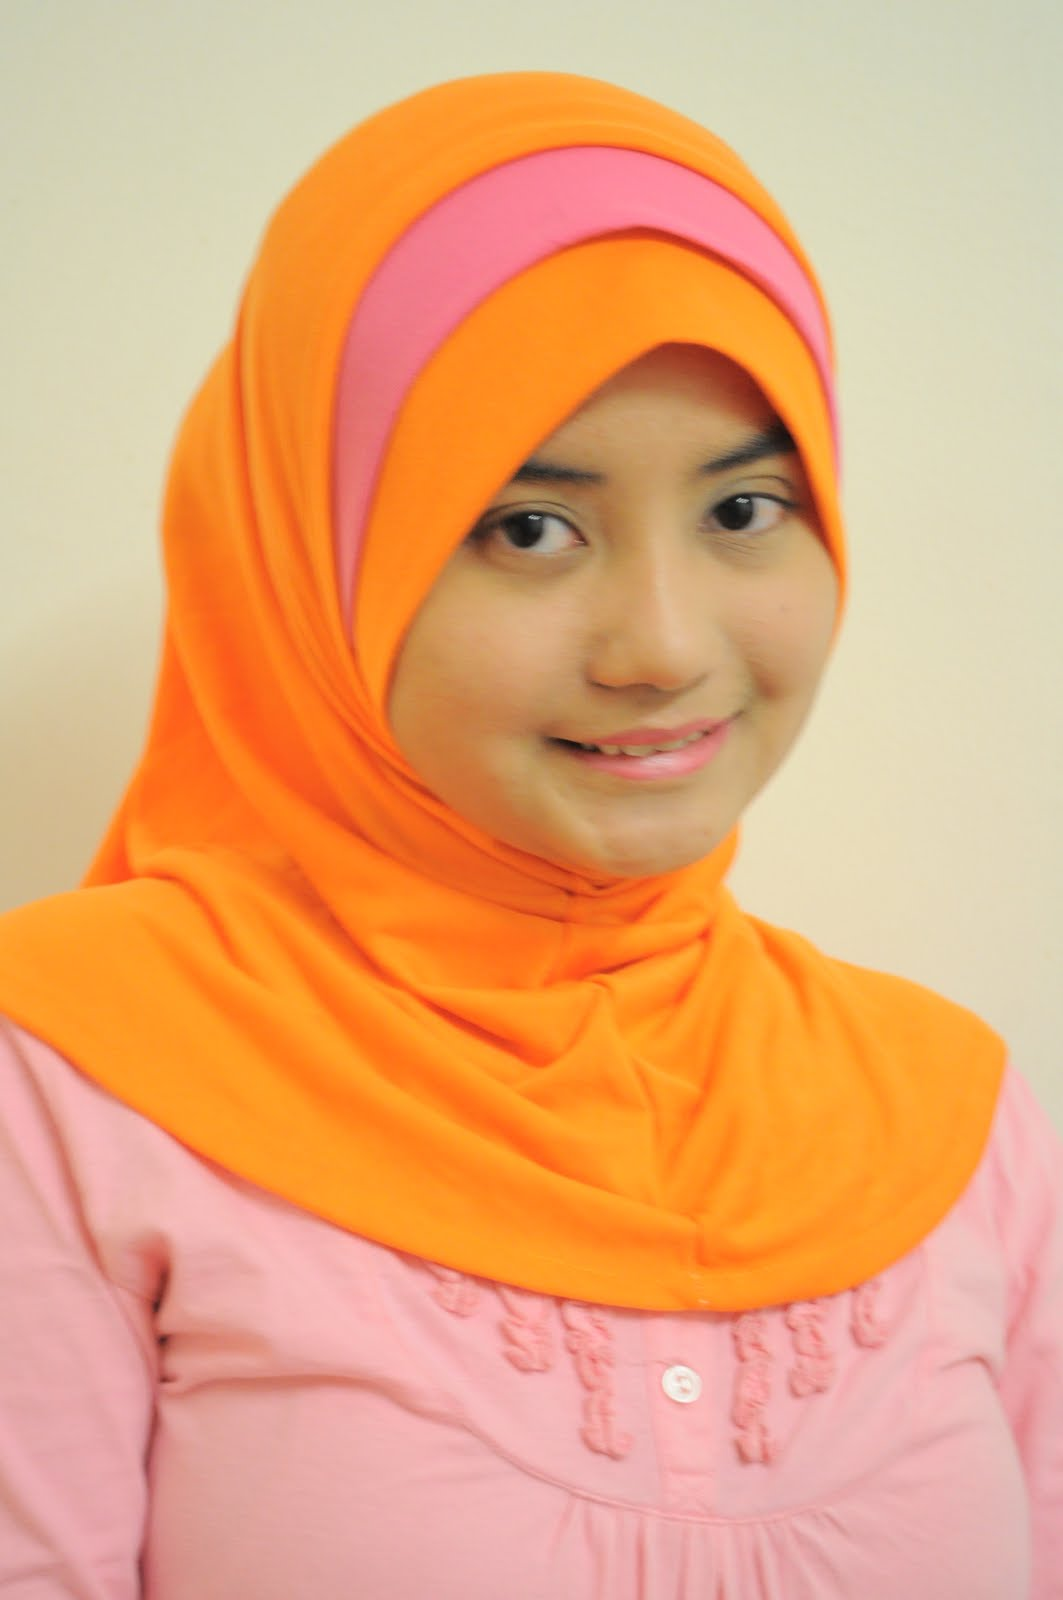 Office Furniture Kitchener Waterloo Buat Gambar Hijab Model Hijab Buat Muka Bulat